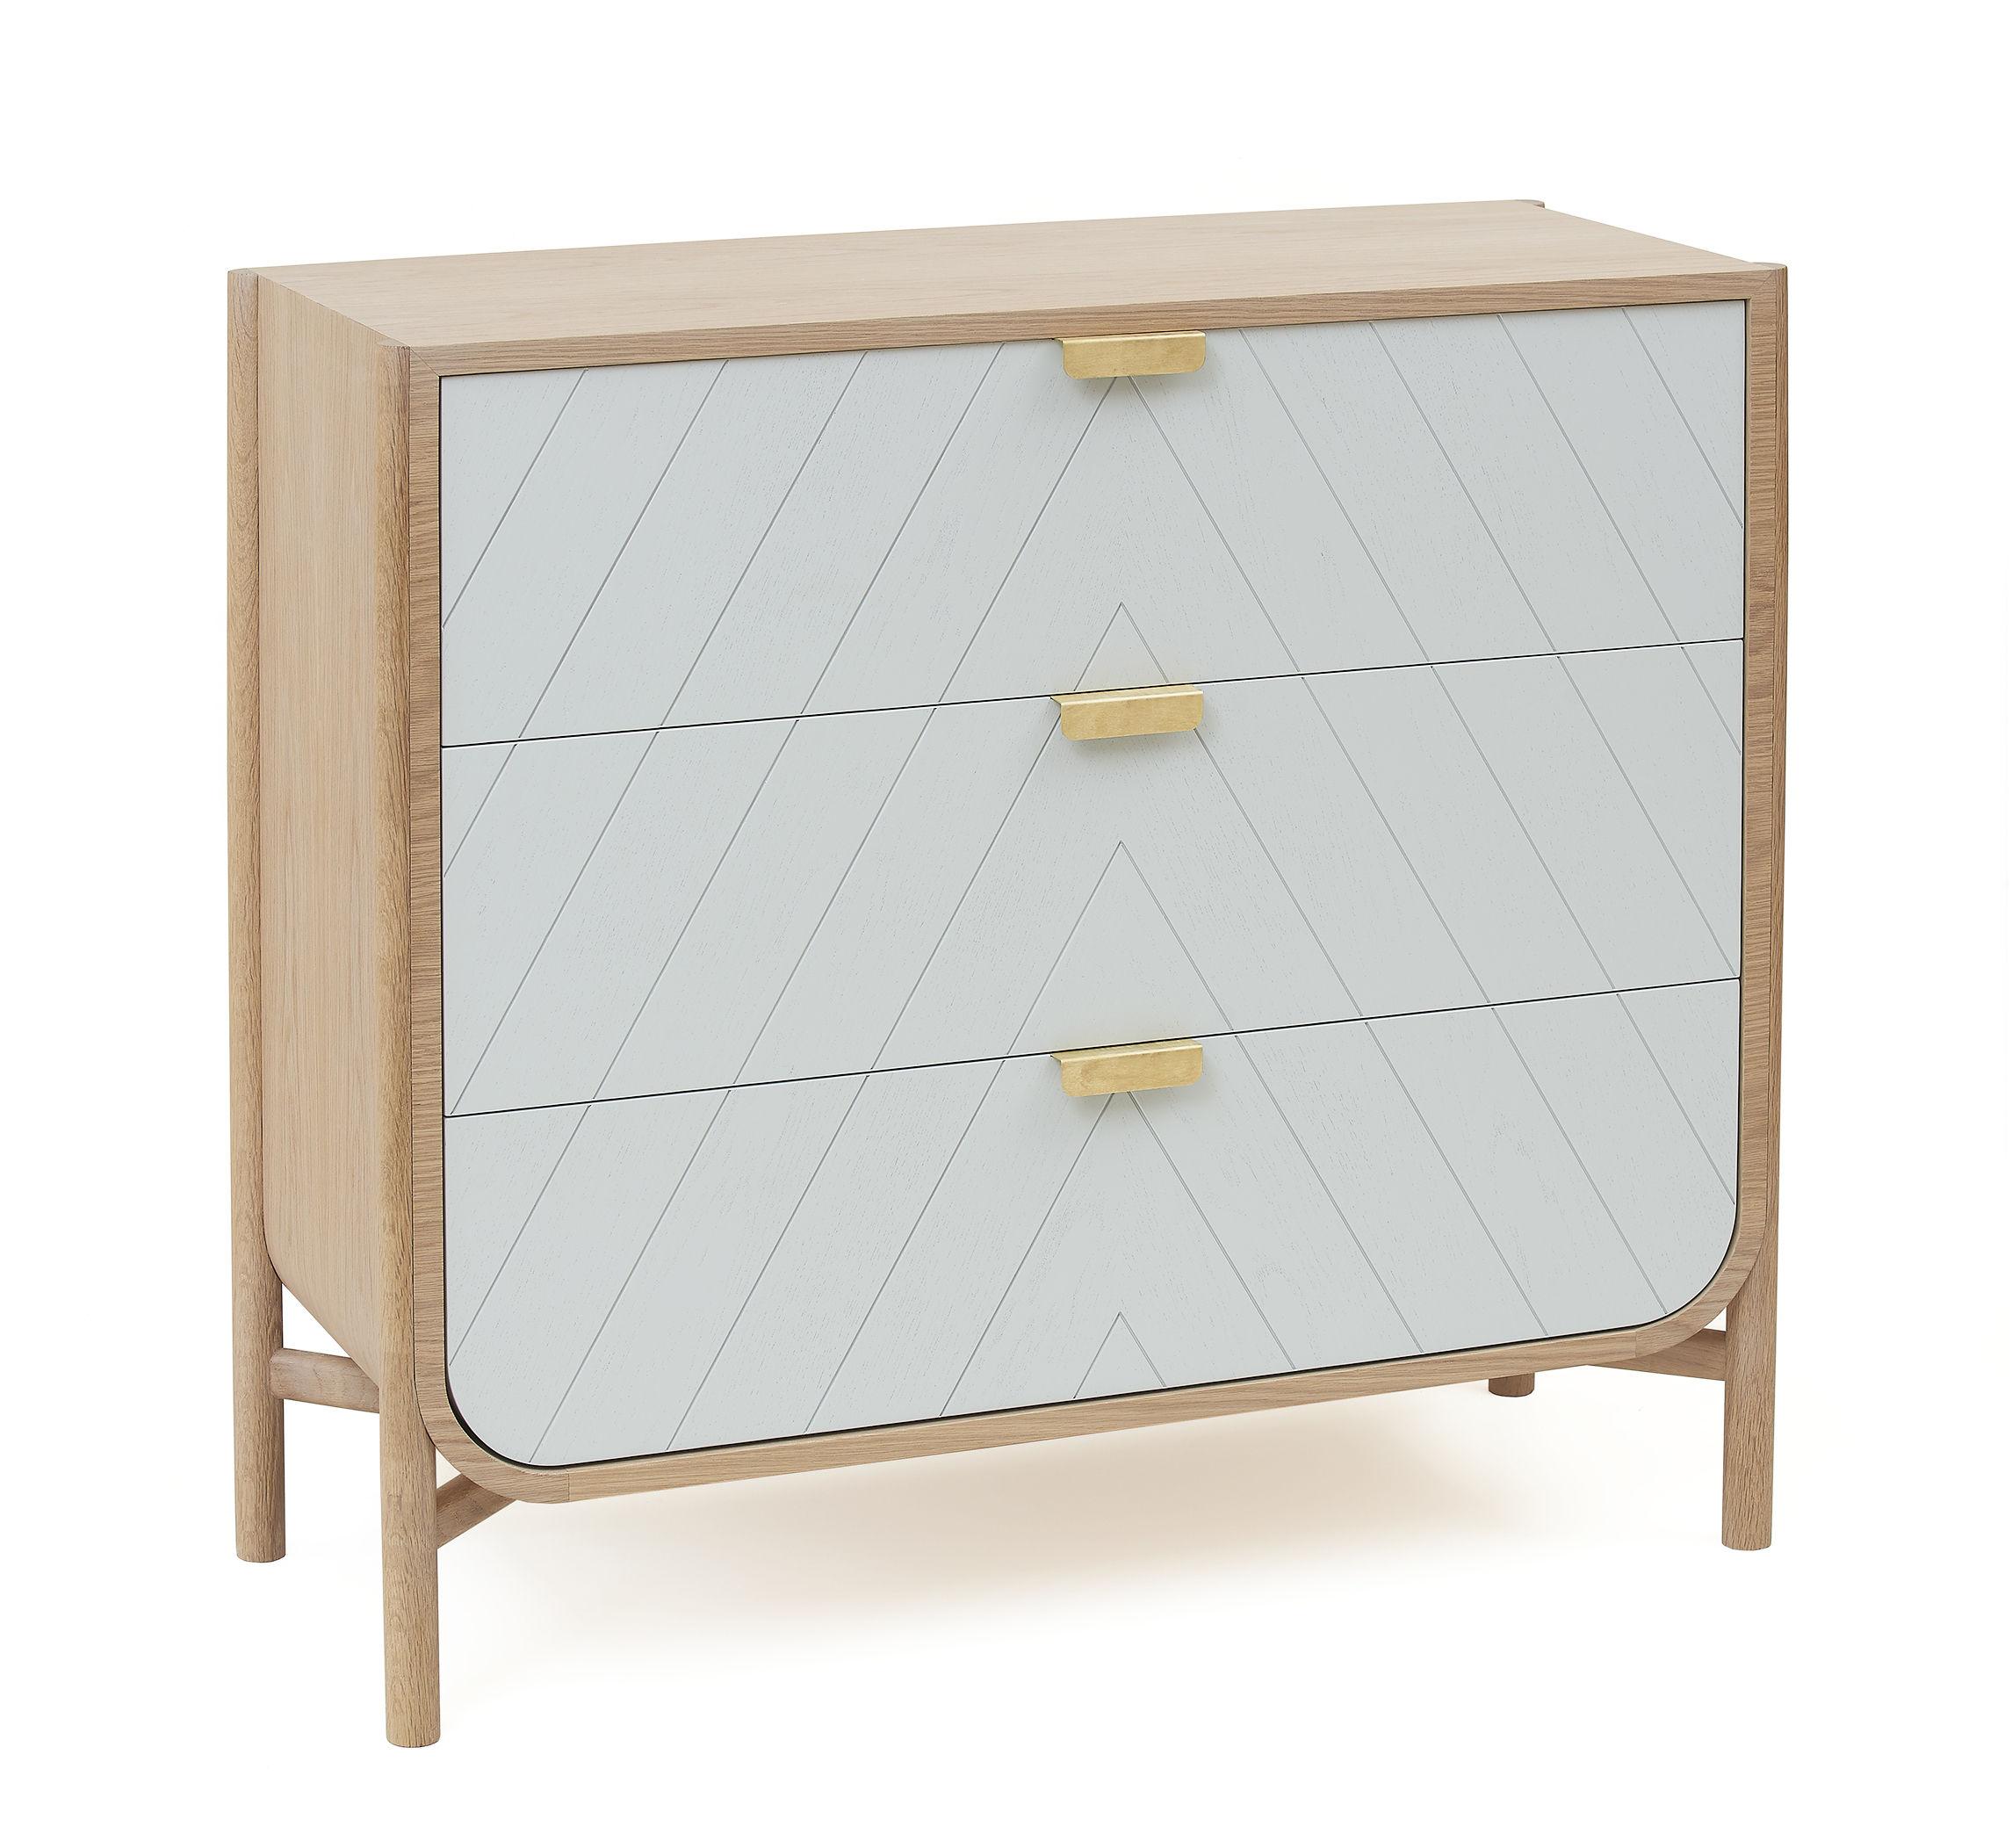 commode marius l 100 x h 90 cm gris ch ne poign es laiton hart made in design. Black Bedroom Furniture Sets. Home Design Ideas